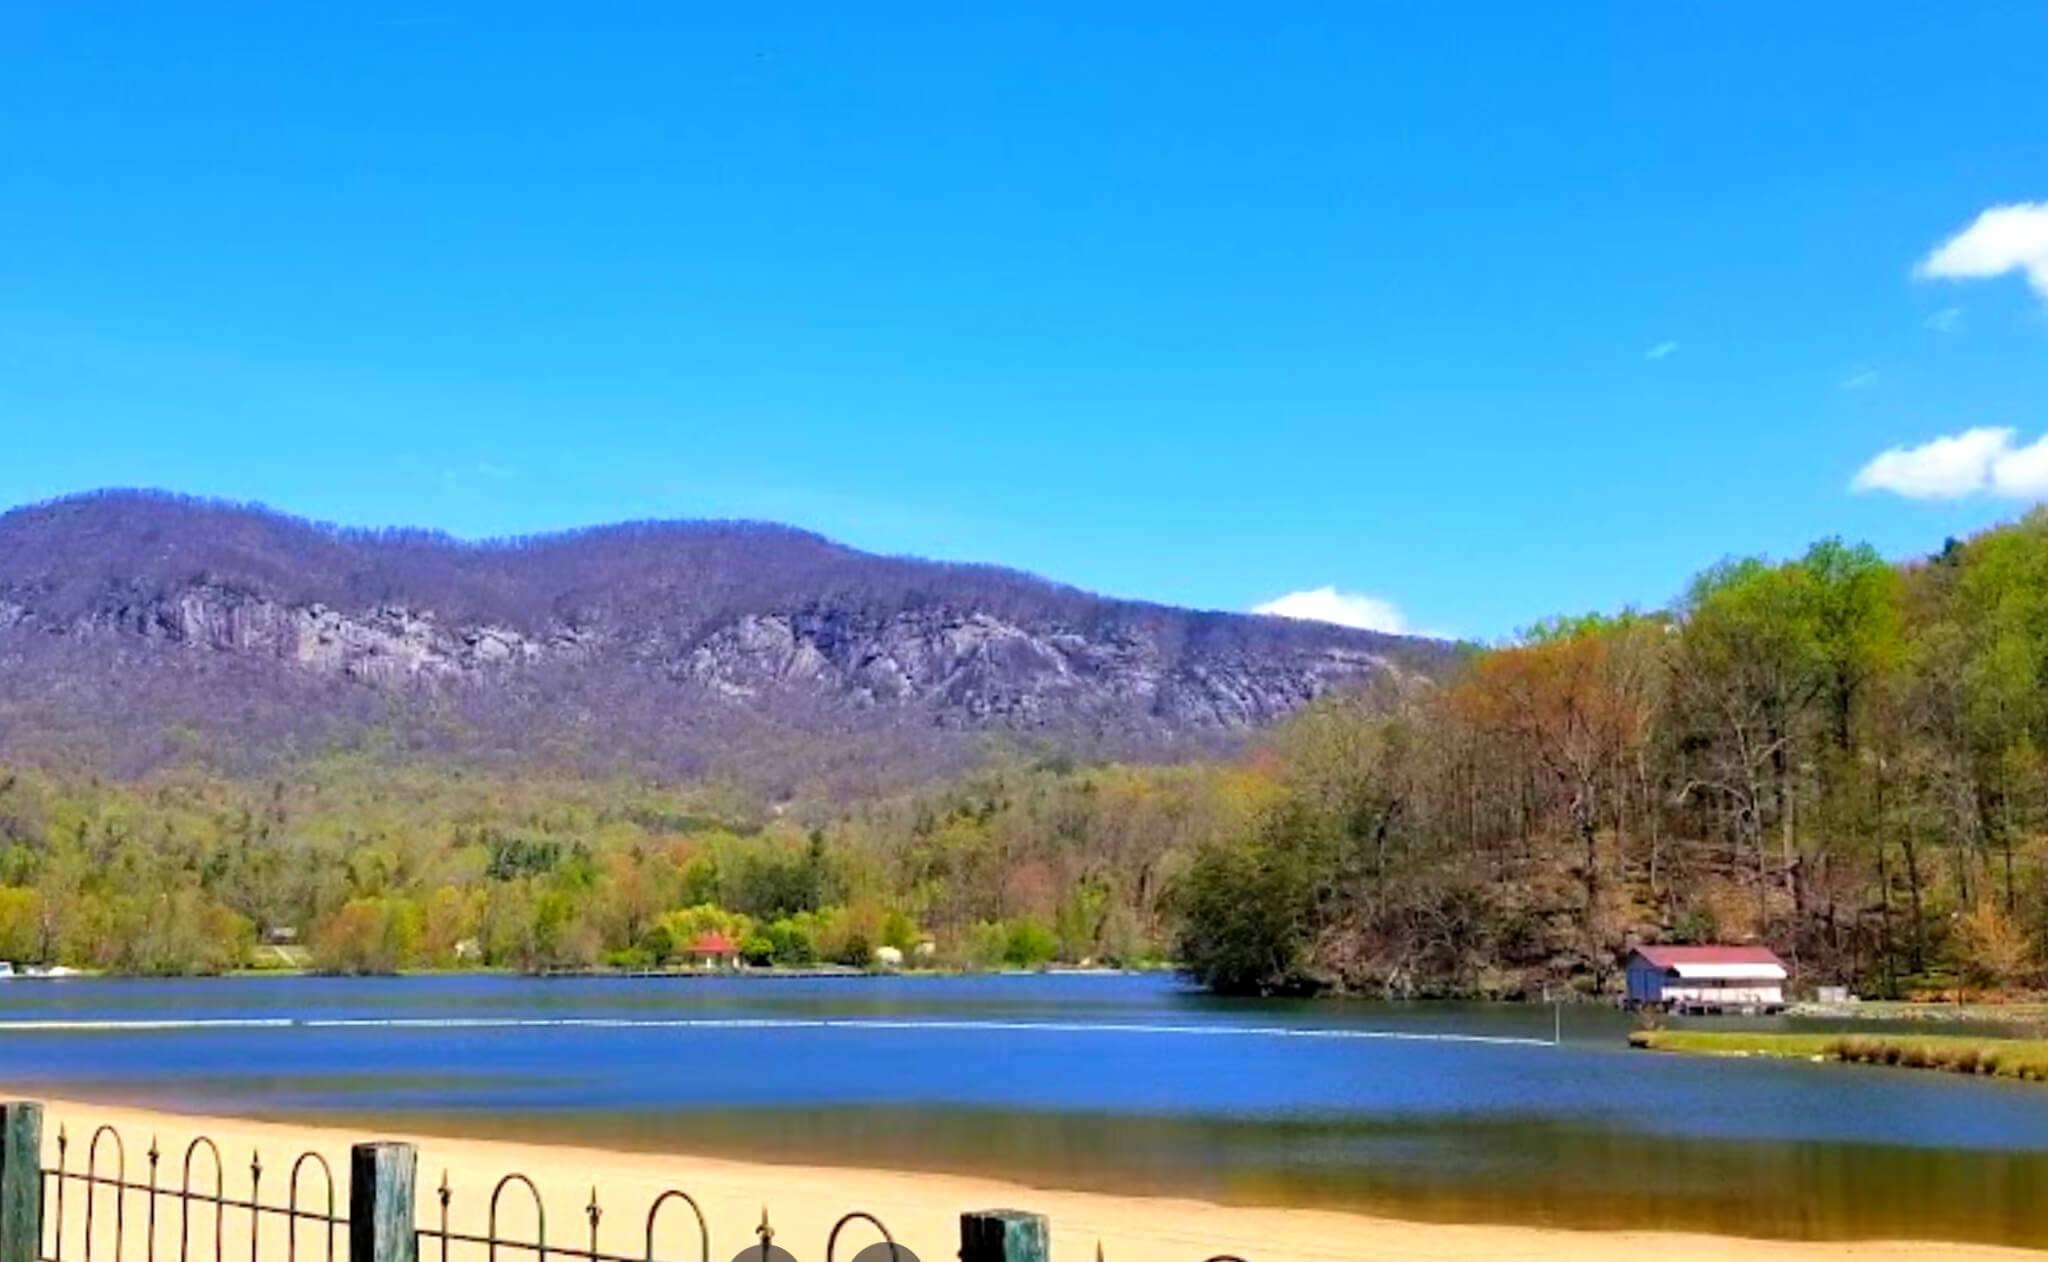 Lure-Lake-Fishing-Report-Guide-North-Carolina-NC-01-2